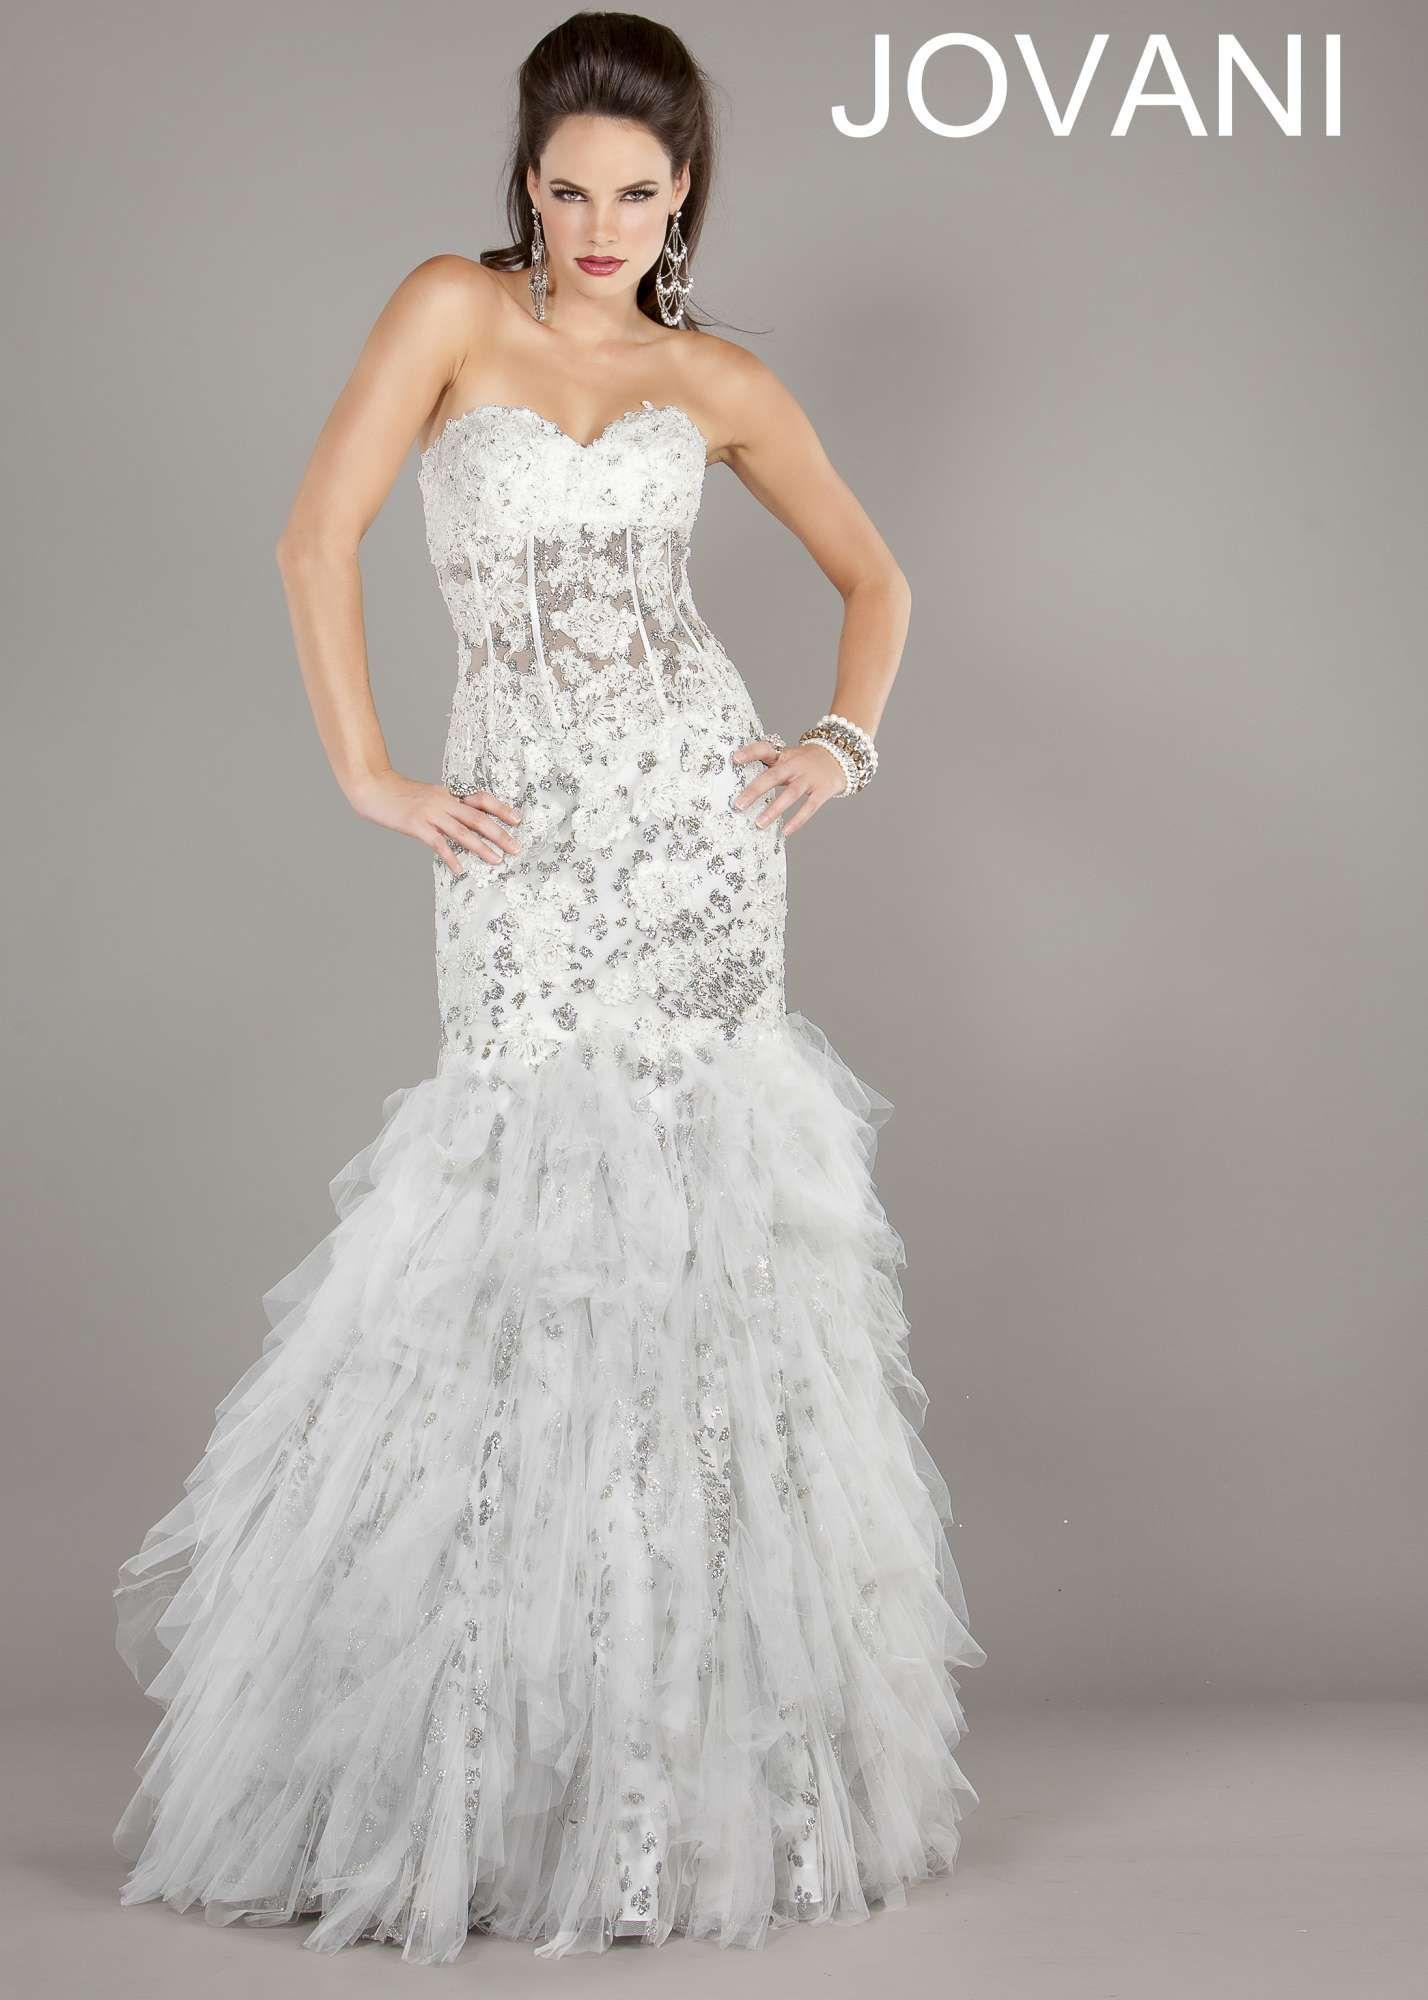 Jovani mermaid prom dress wedding dress gowns online and wedding